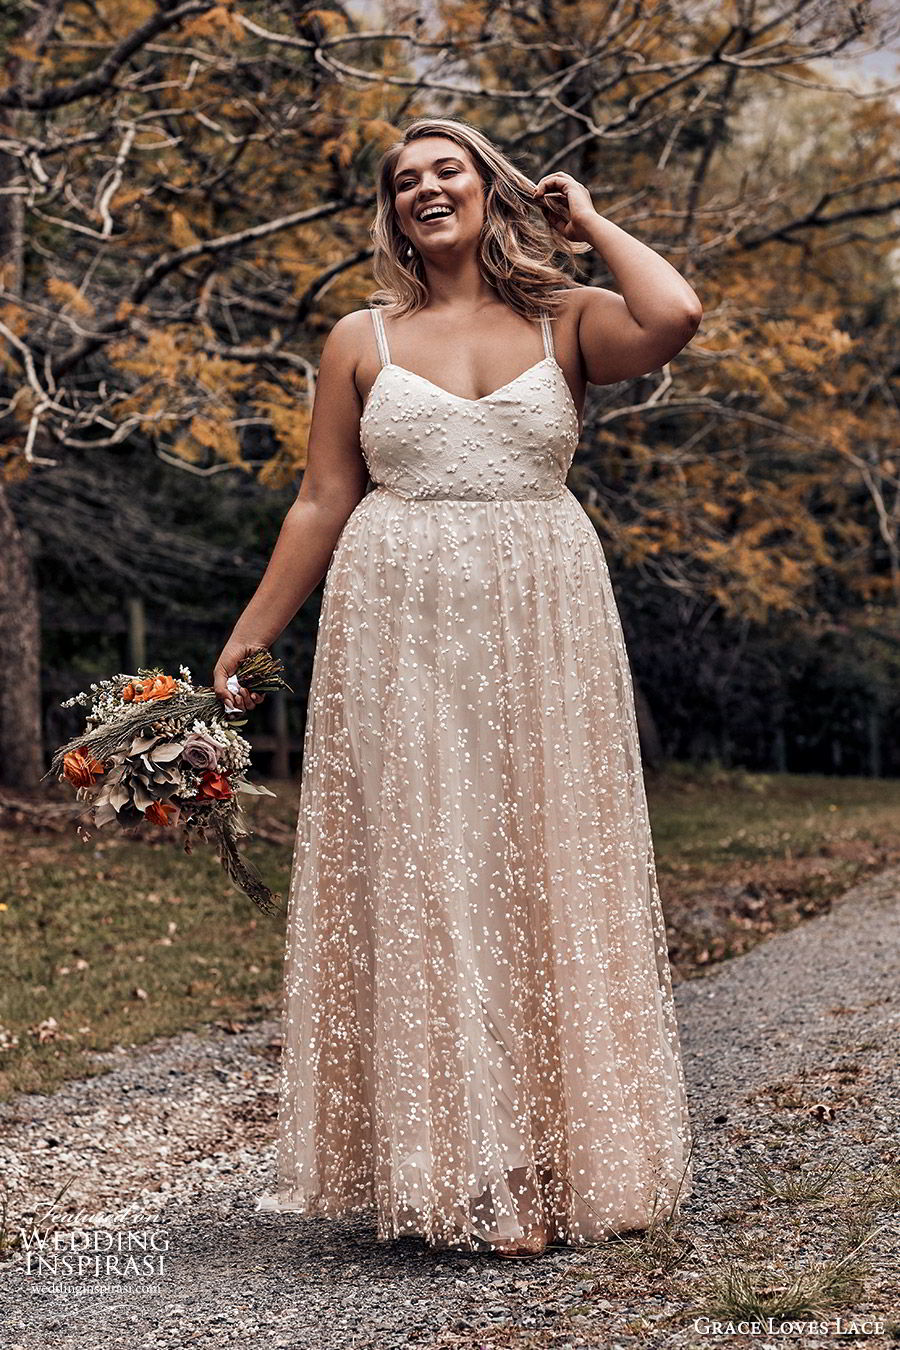 grace loves lace 2019 bridal sleeveless straps sweetheart neckline fully embellished a line ball gown wedding dress romantic elegant plus size blush (5) mv